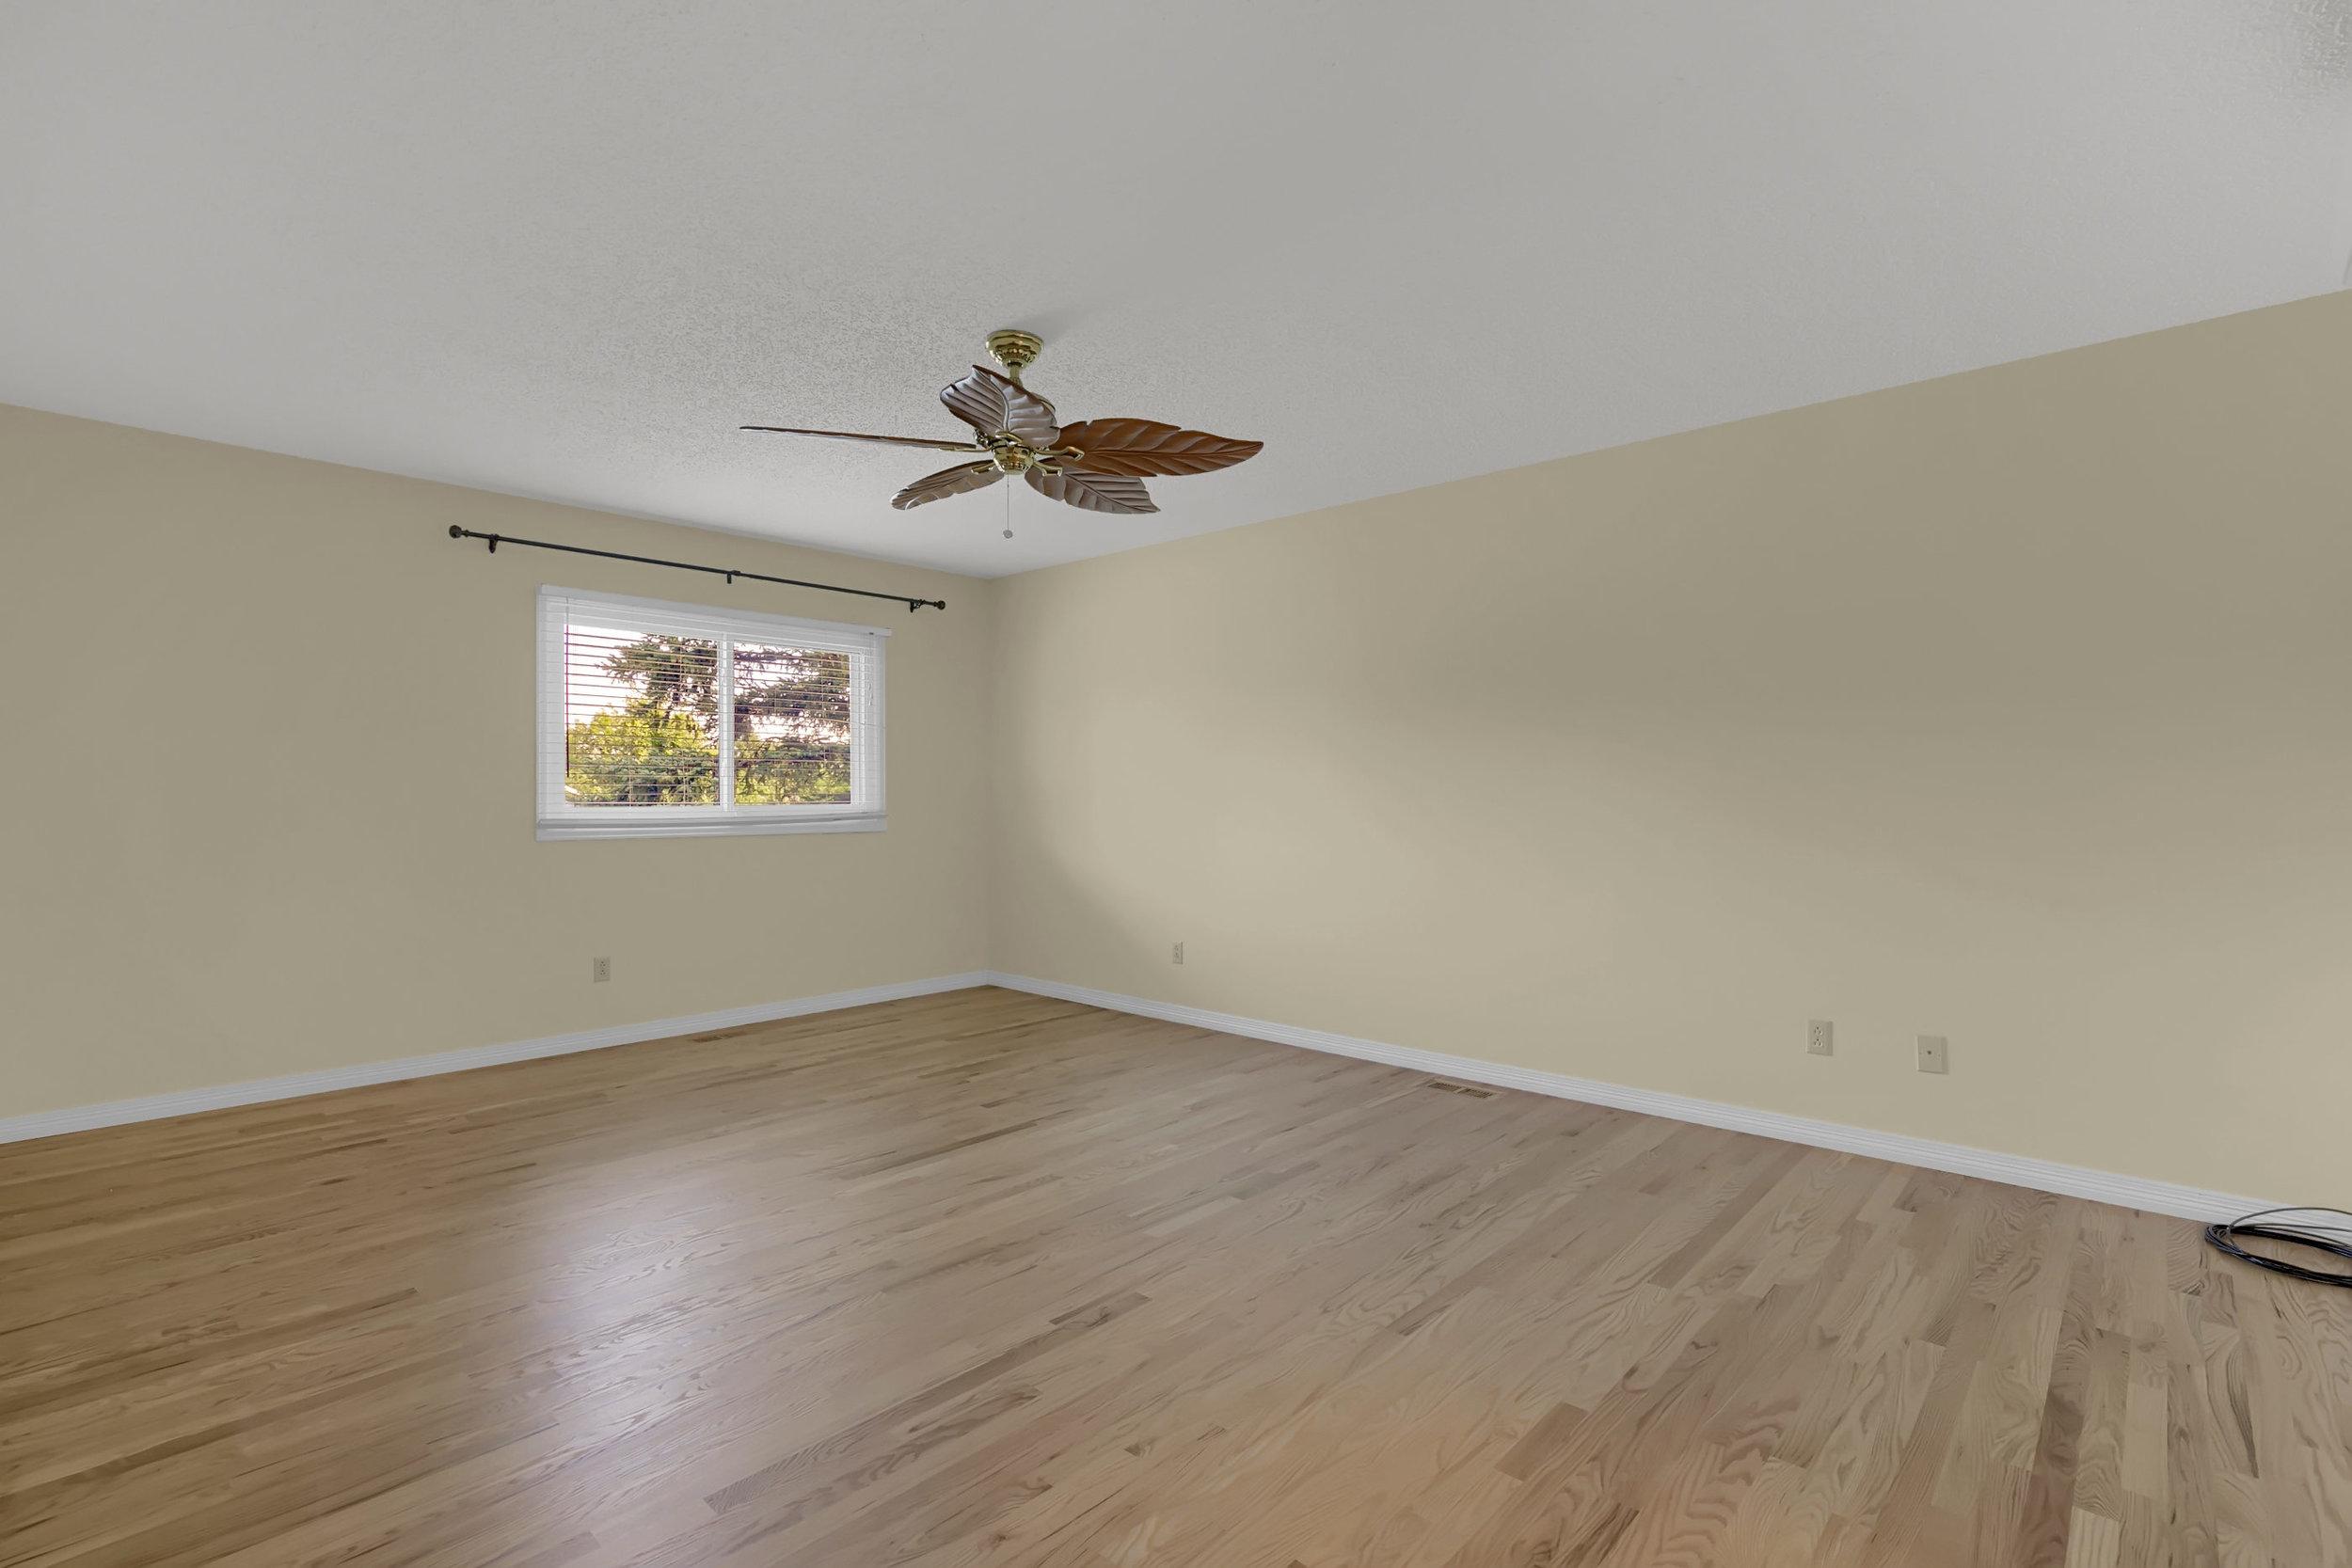 4215 Stonehaven Dr Colorado-print-030-026-Bedroom-2800x1867-300dpi.jpg